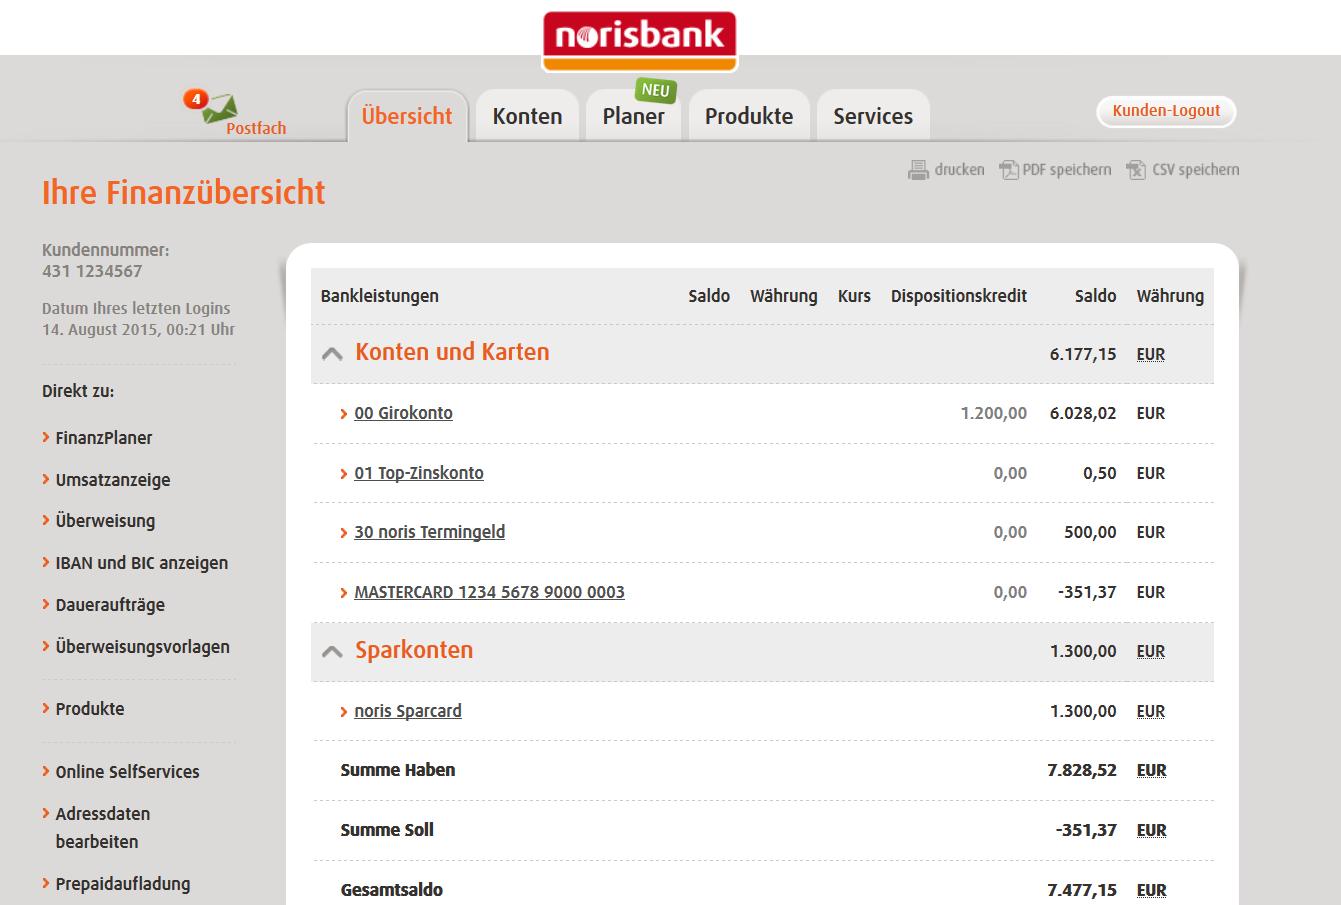 Kombiangebot auf norisbank.de